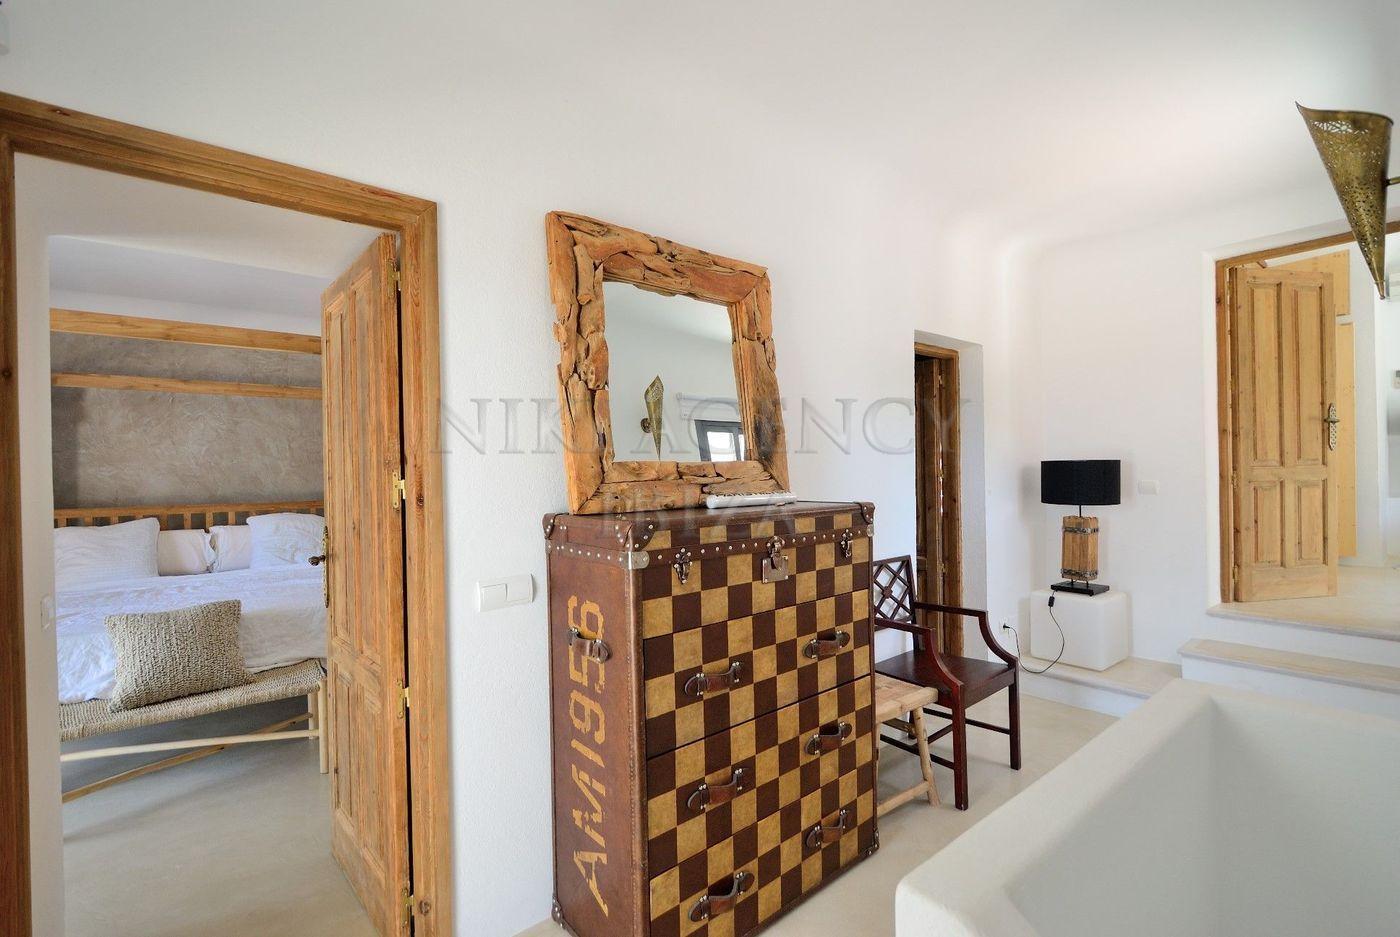 15. House for sale in Sant Josep de sa Talaia Ibiza - Fantastic 4 Bed Villa For Sale in Sant Josep de sa Talaia, Ibiza!